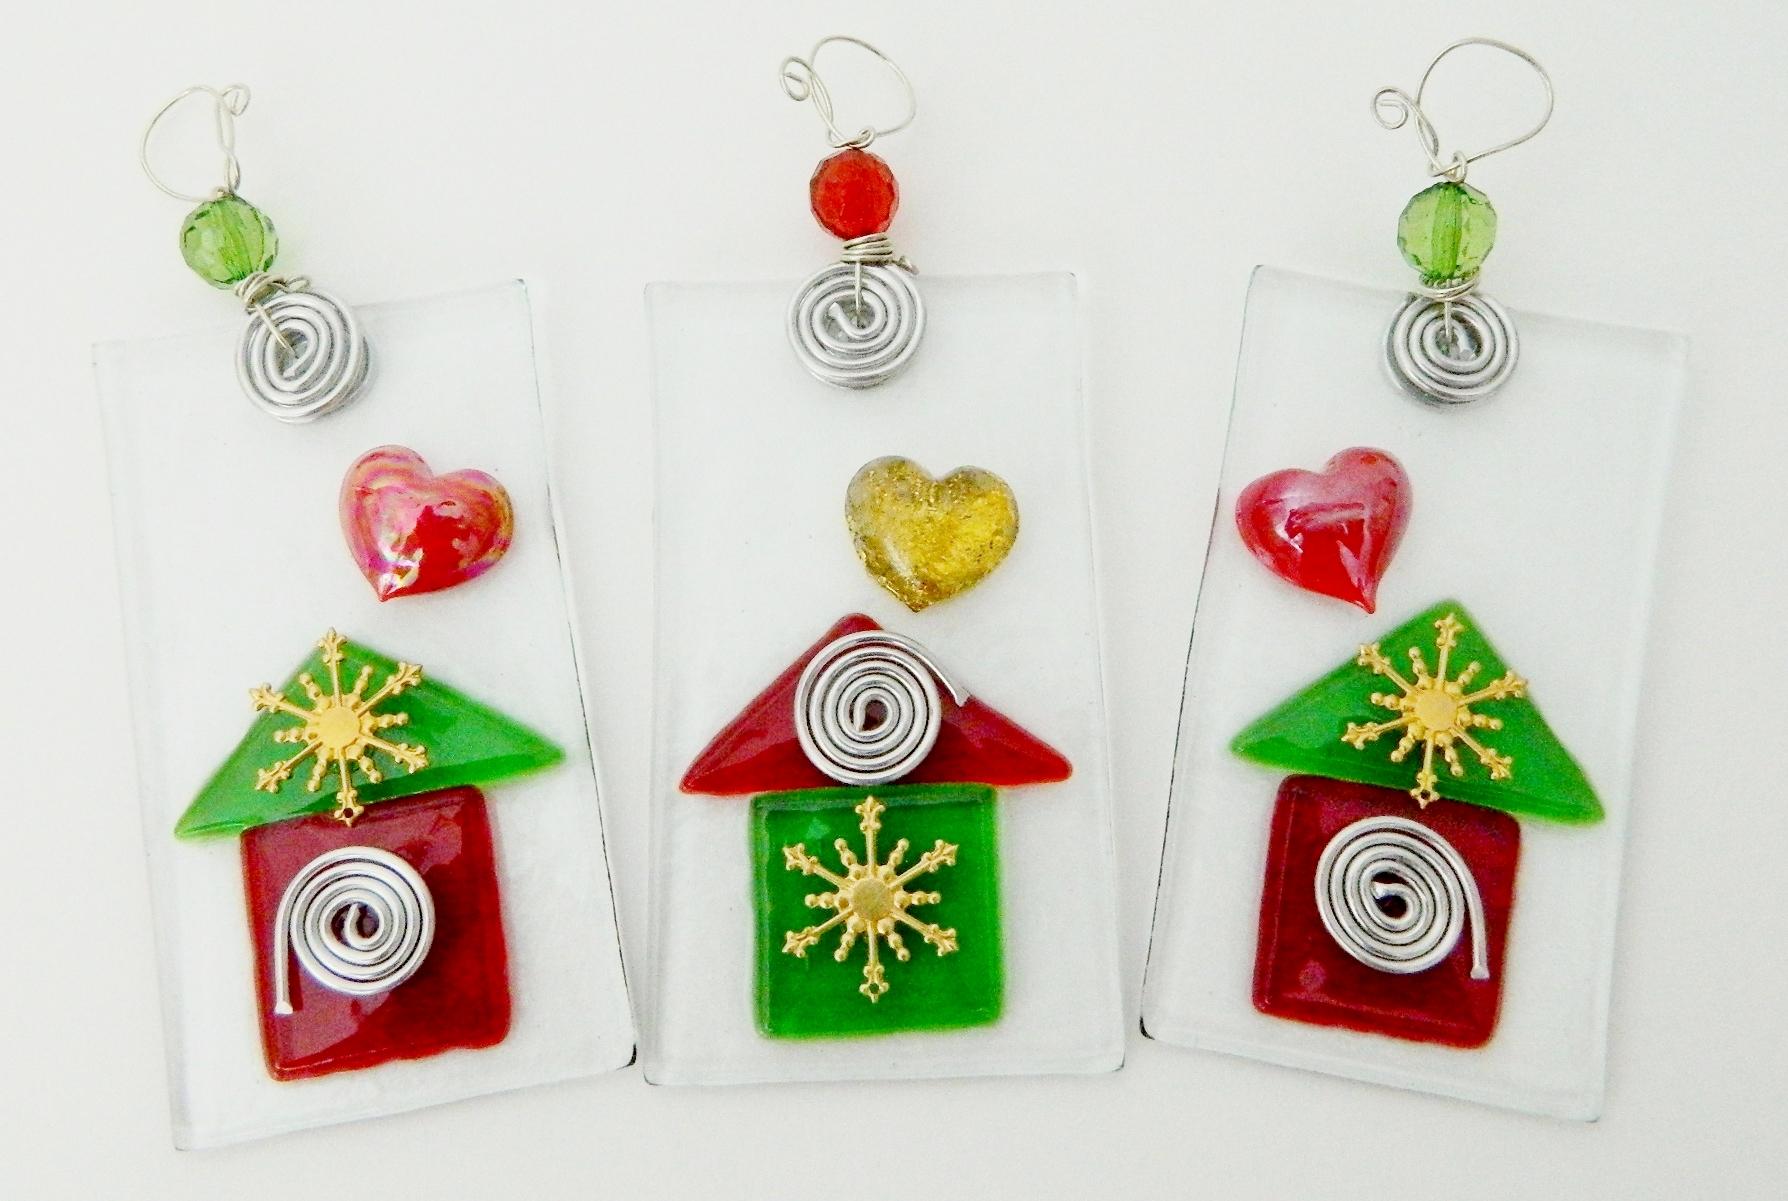 Loving Homes, available at Paisley Pomegranate